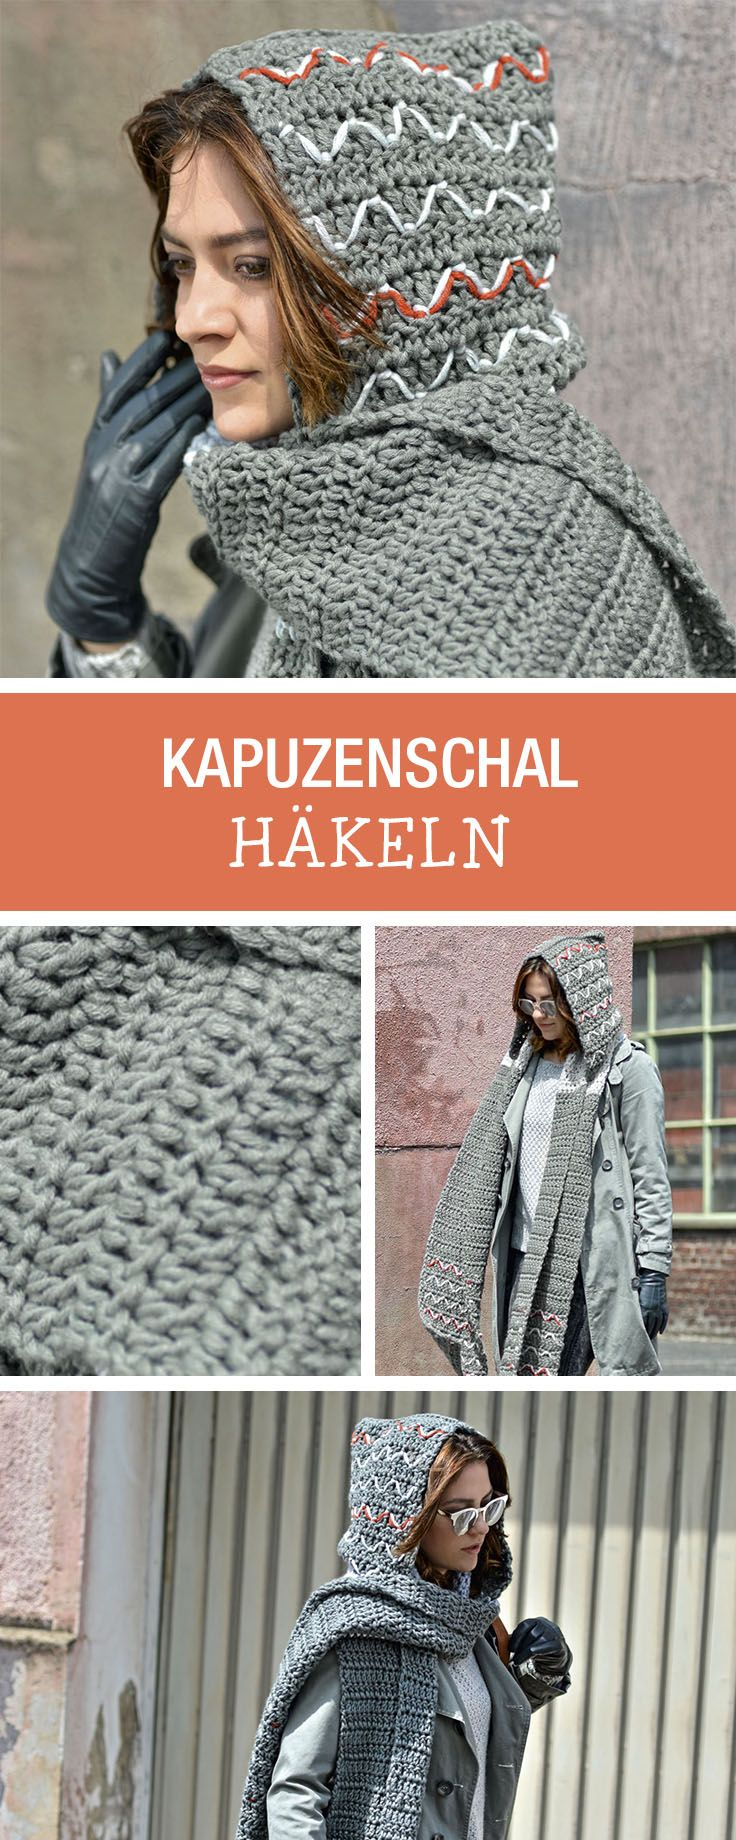 Diy Anleitung Modetrend Für Herbstsaison Kapuzenschal Selbst